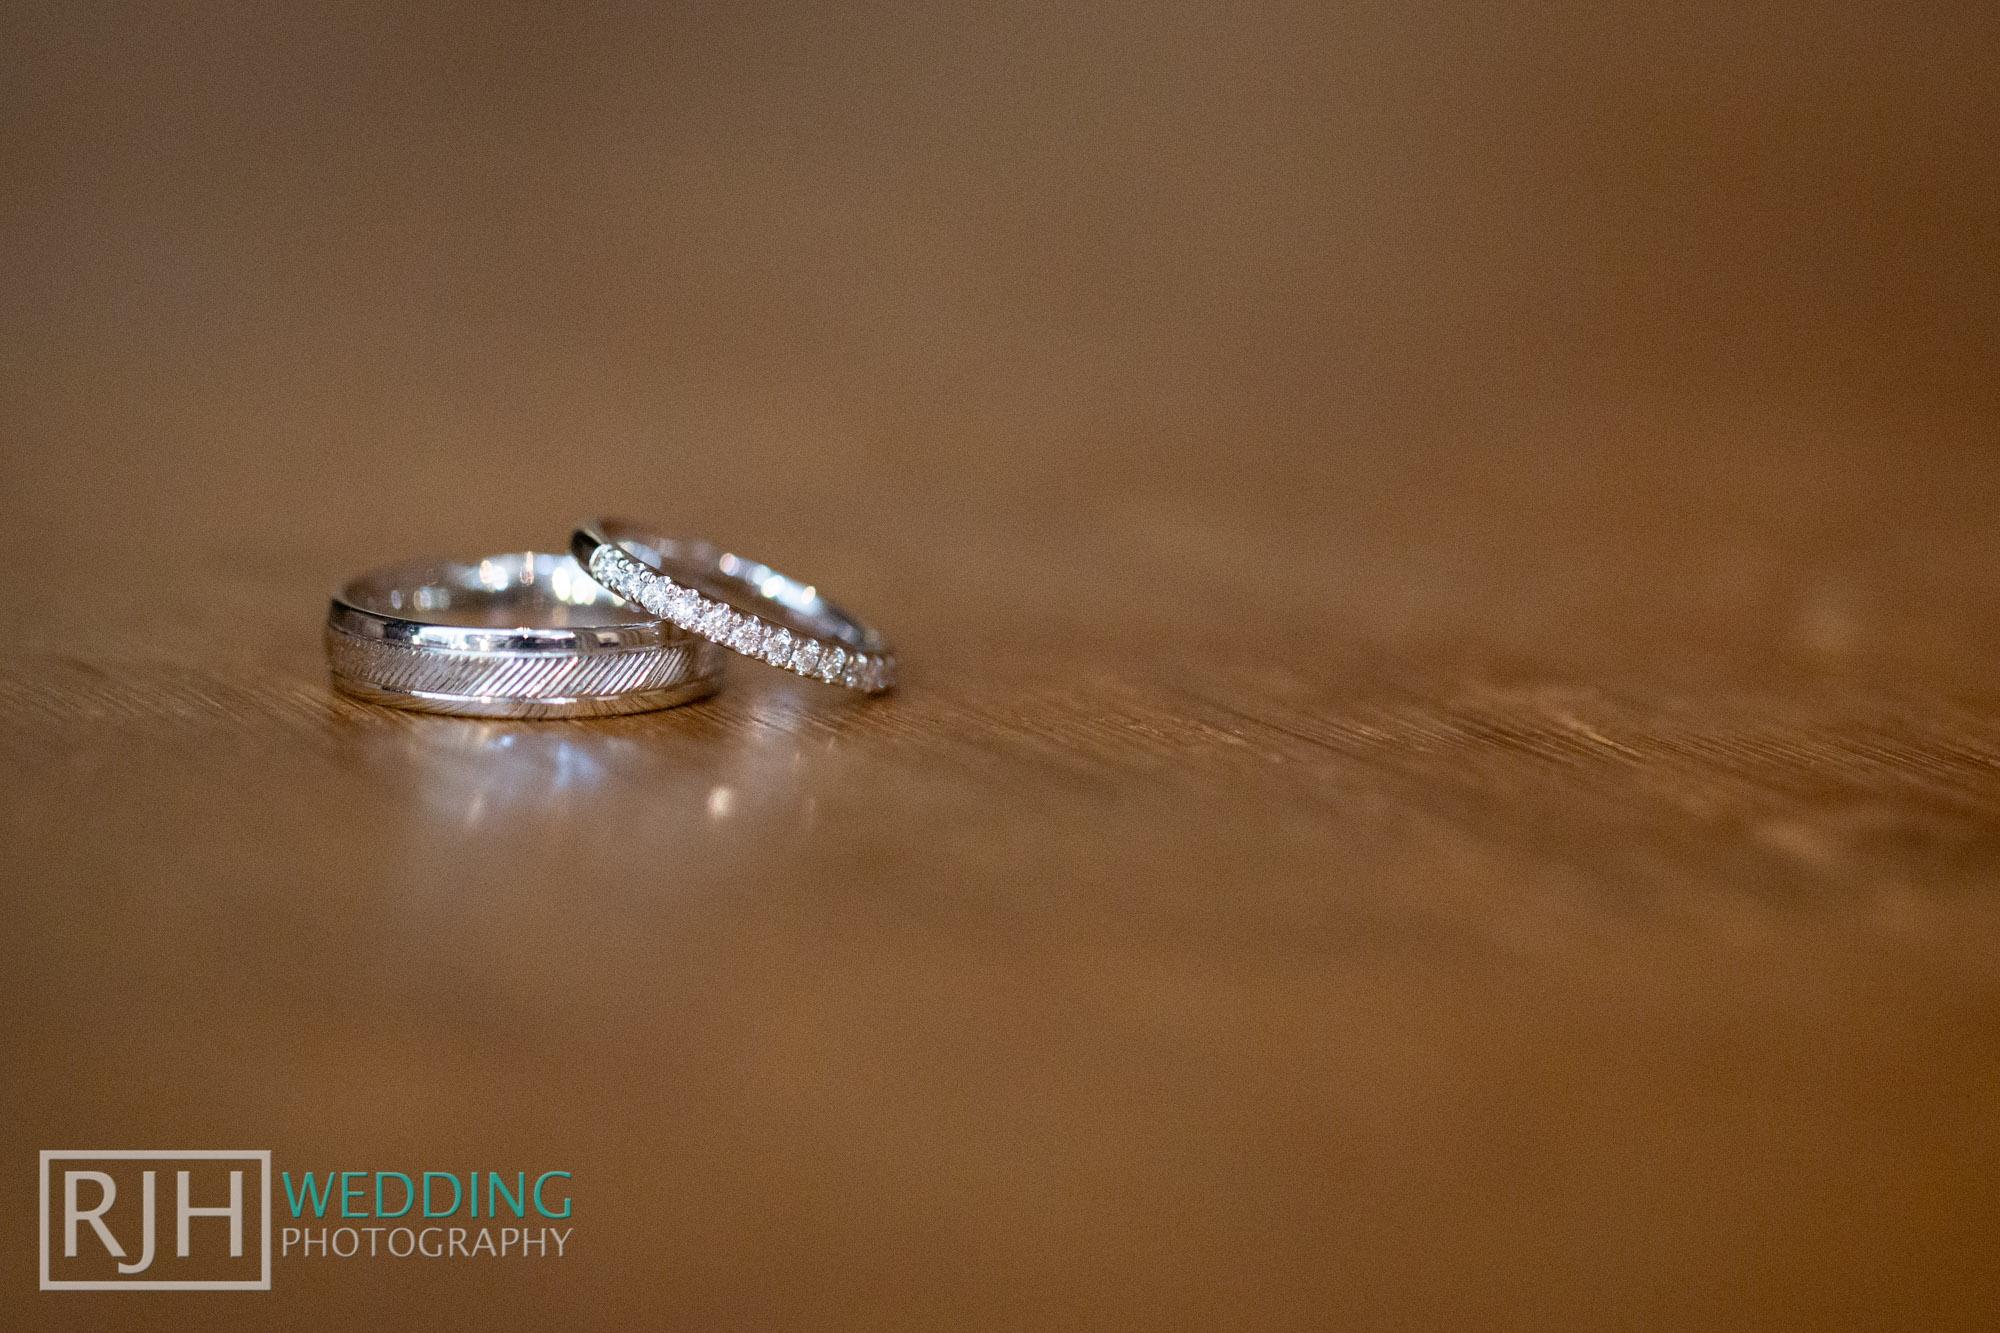 Oulton Hall Wedding Photography_Goodwill-Hall_017_RJH17213.jpg